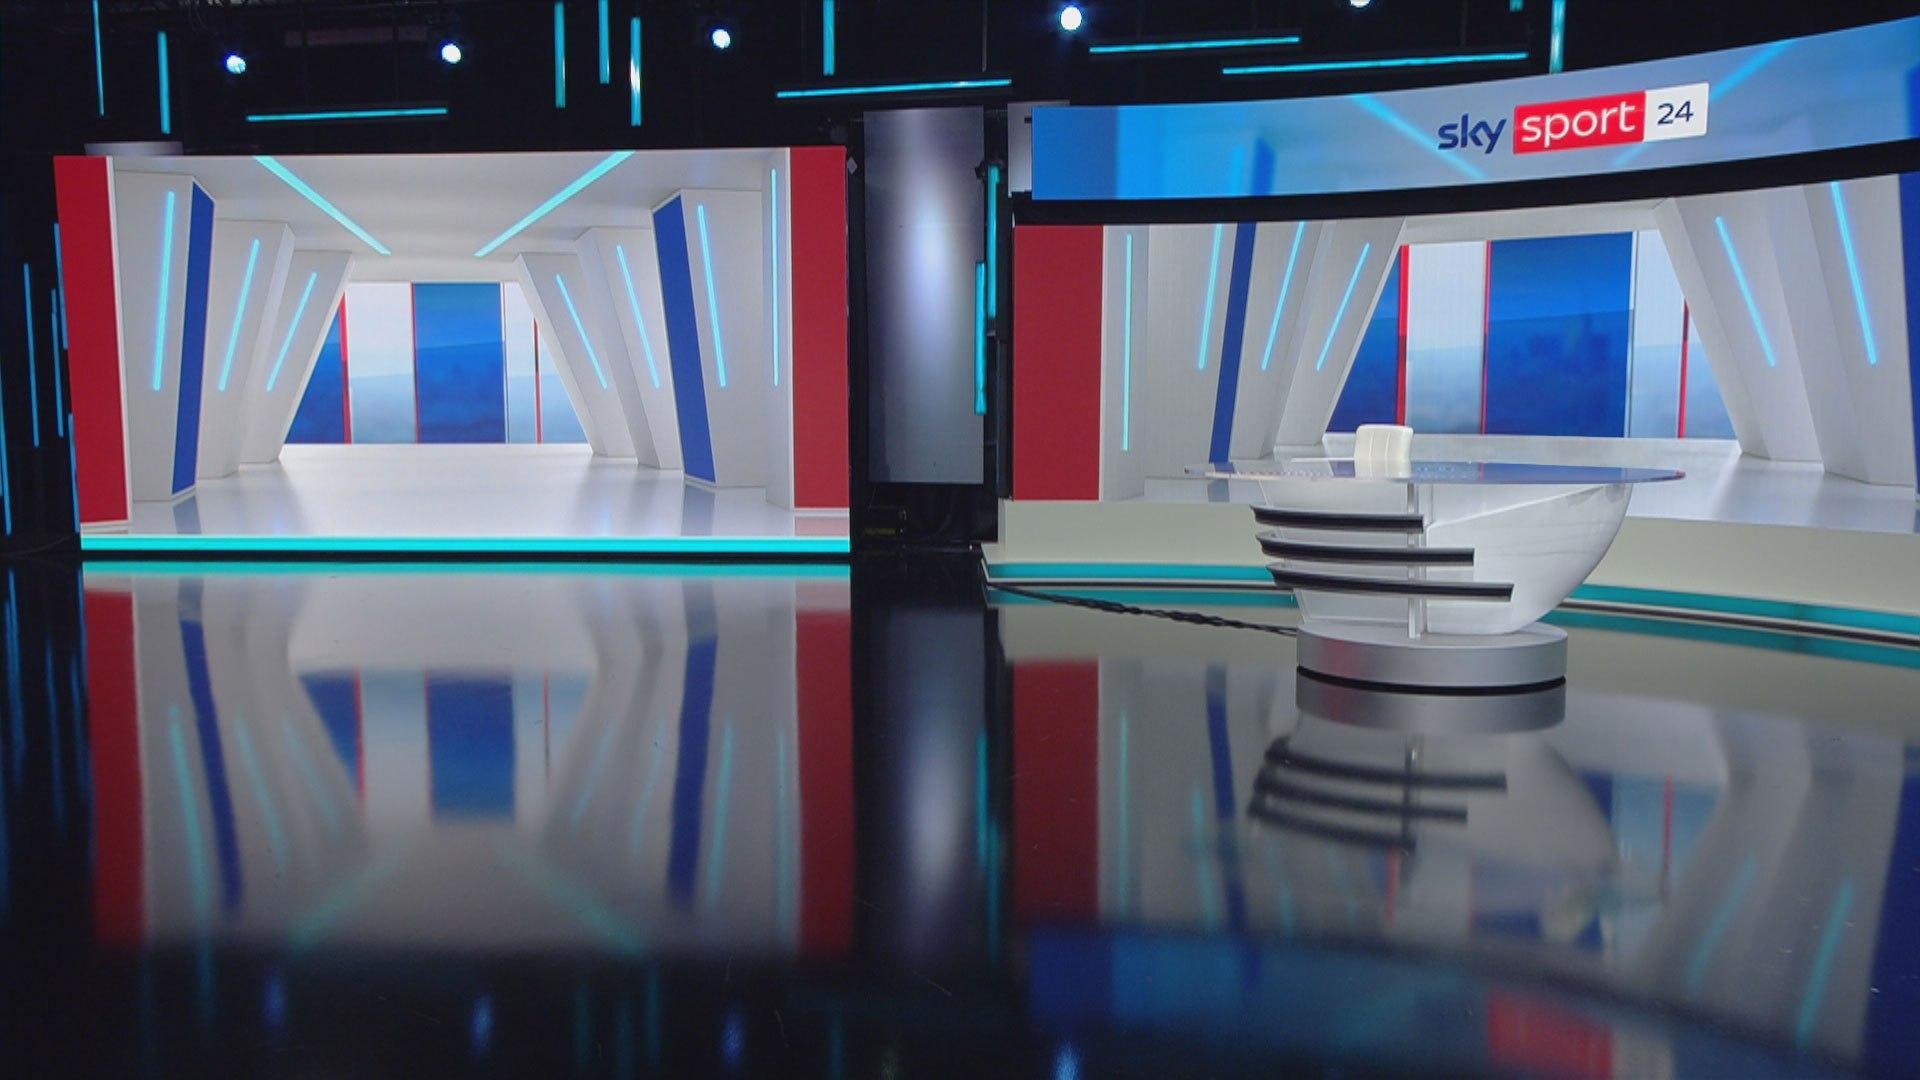 Sky Sport24 Sport 24 TG Prima Serata